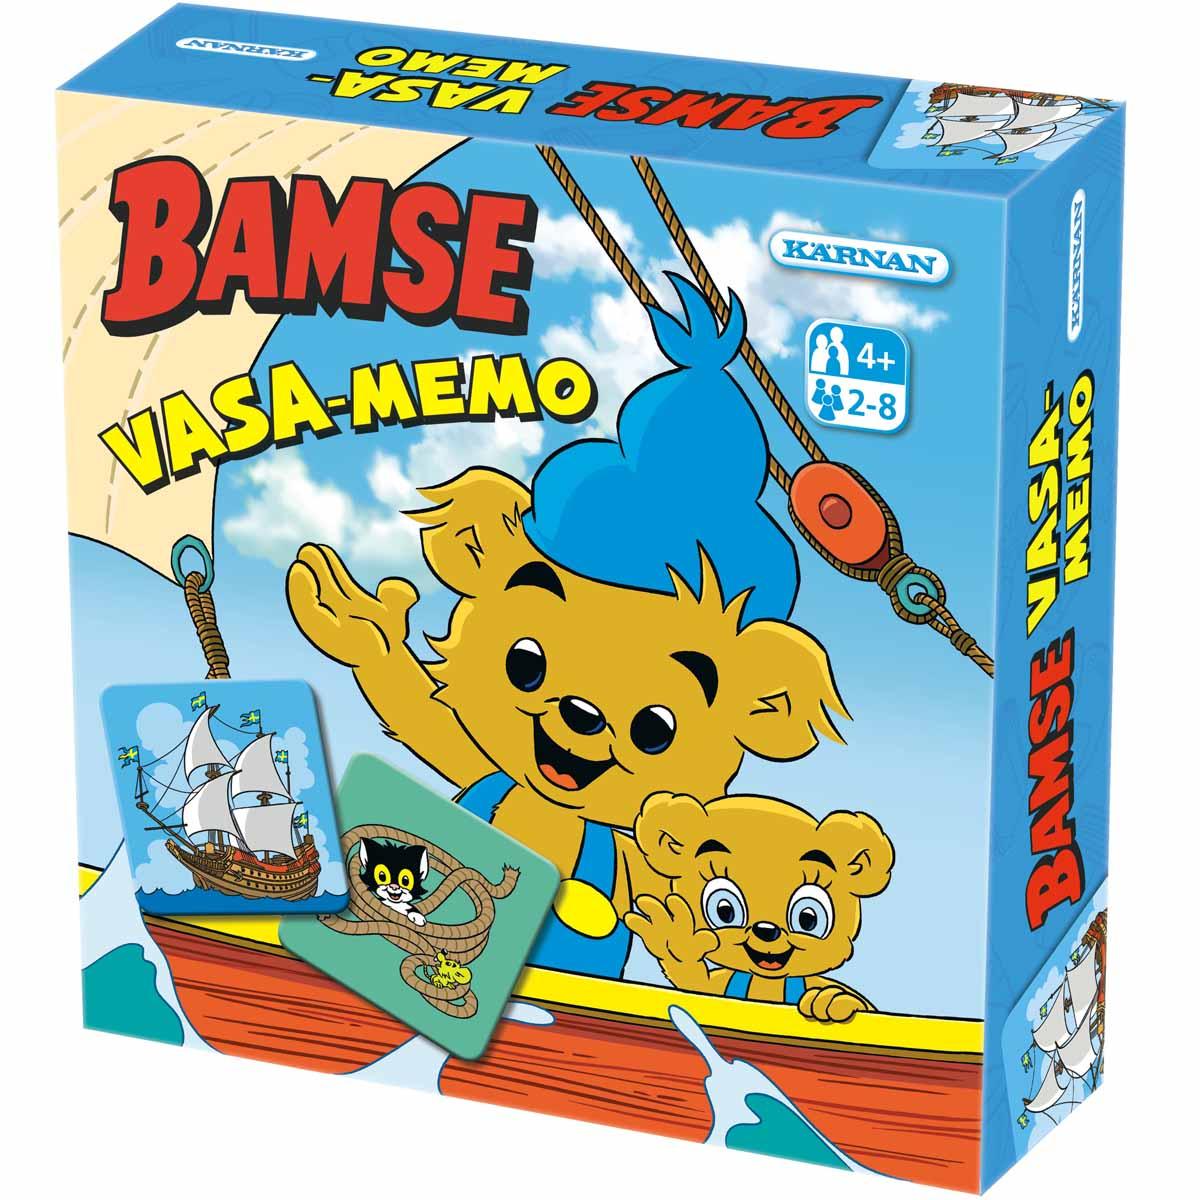 Memo Bamse Vasa